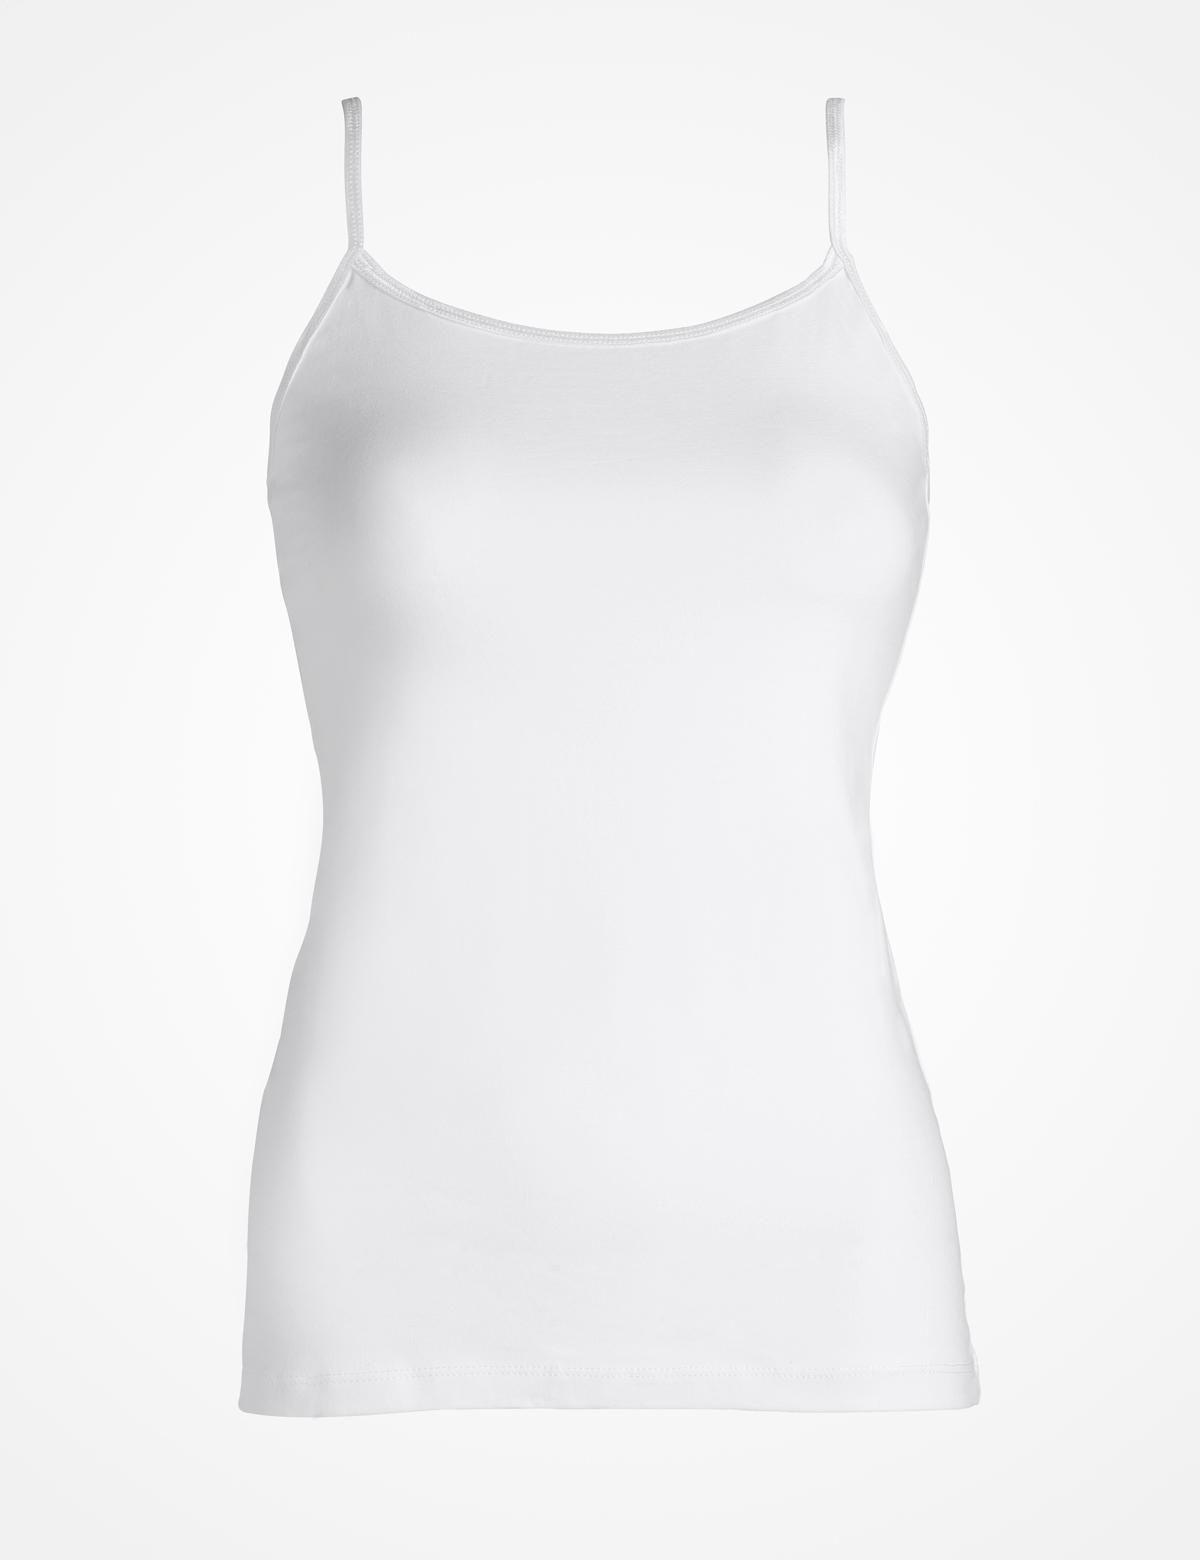 STRAP topp svart   Solid   Jersey top   Toppar   Mode   INDISKA Shop Online